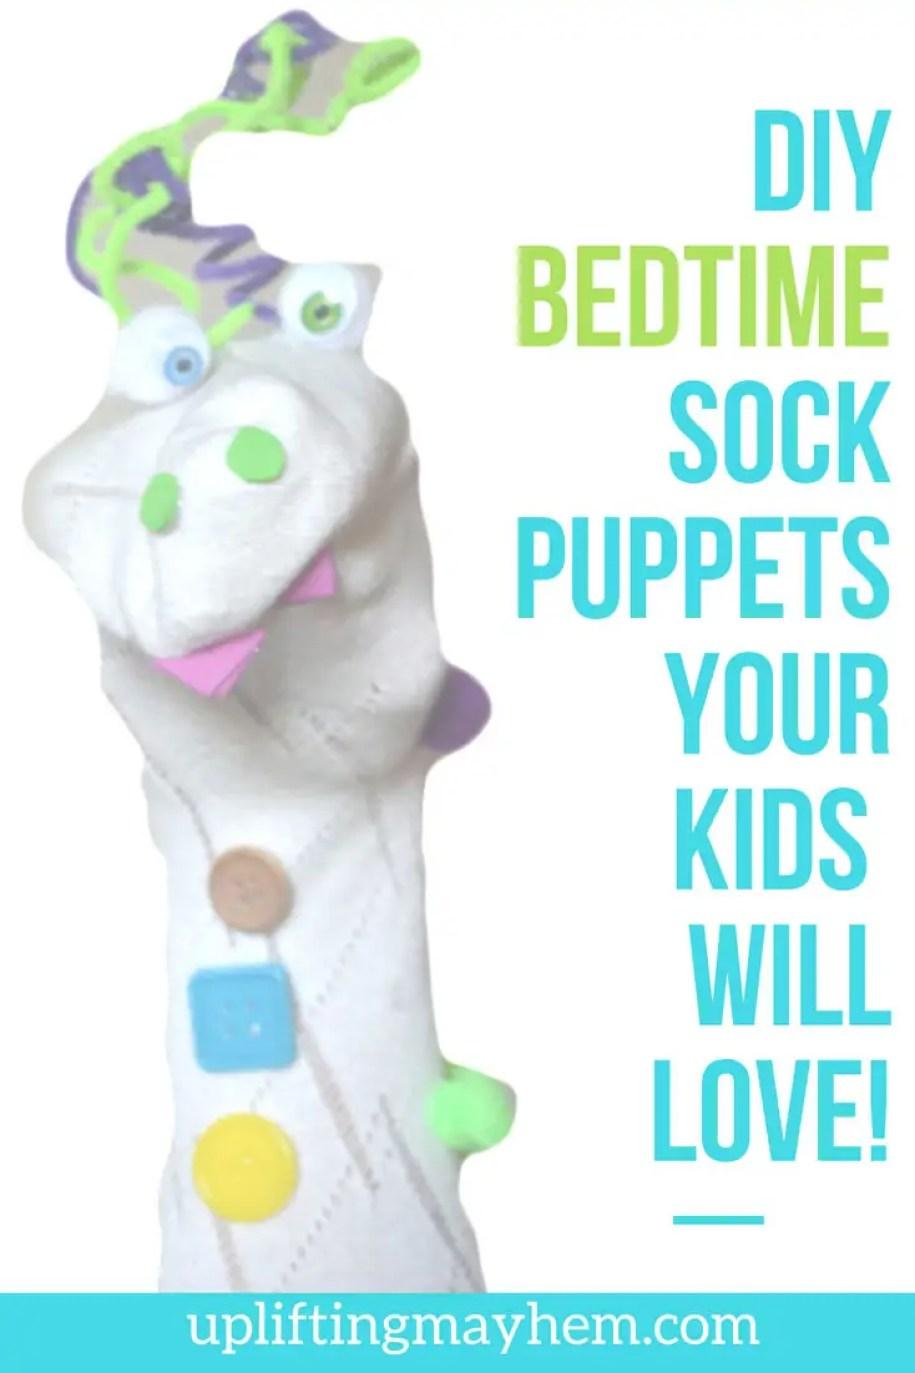 Uncategorized Love Tester Kids diy bedtime sock puppets your kids will love uplifting mayhem love